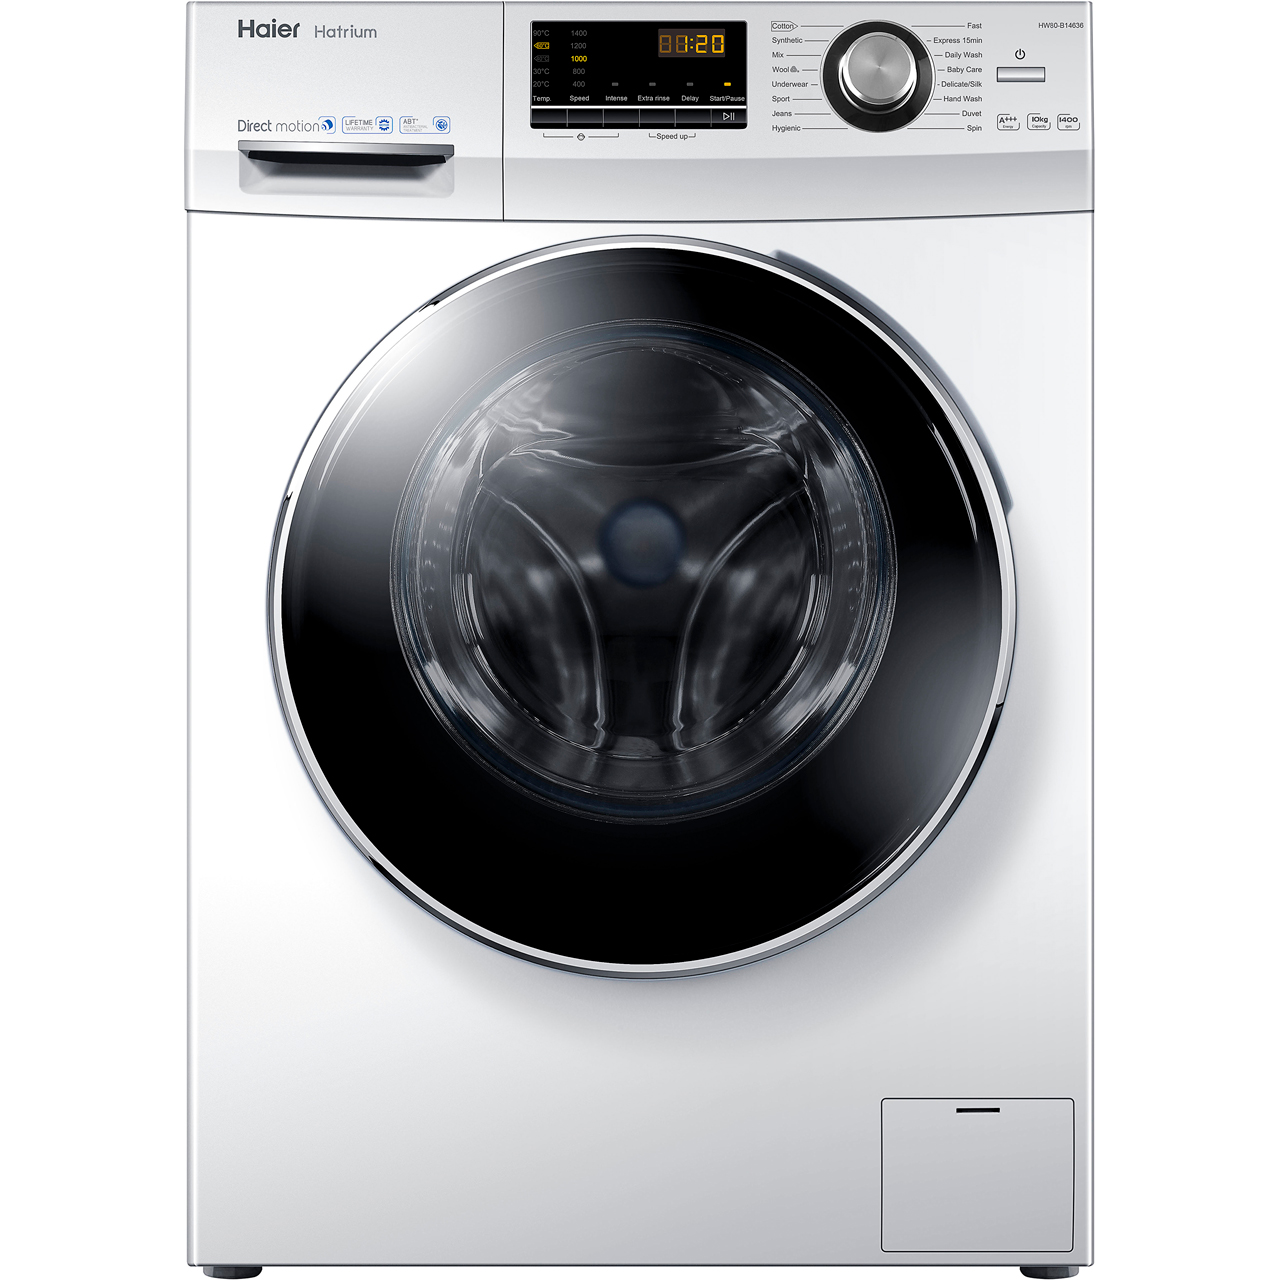 haier super capacity washer. haier super capacity washer